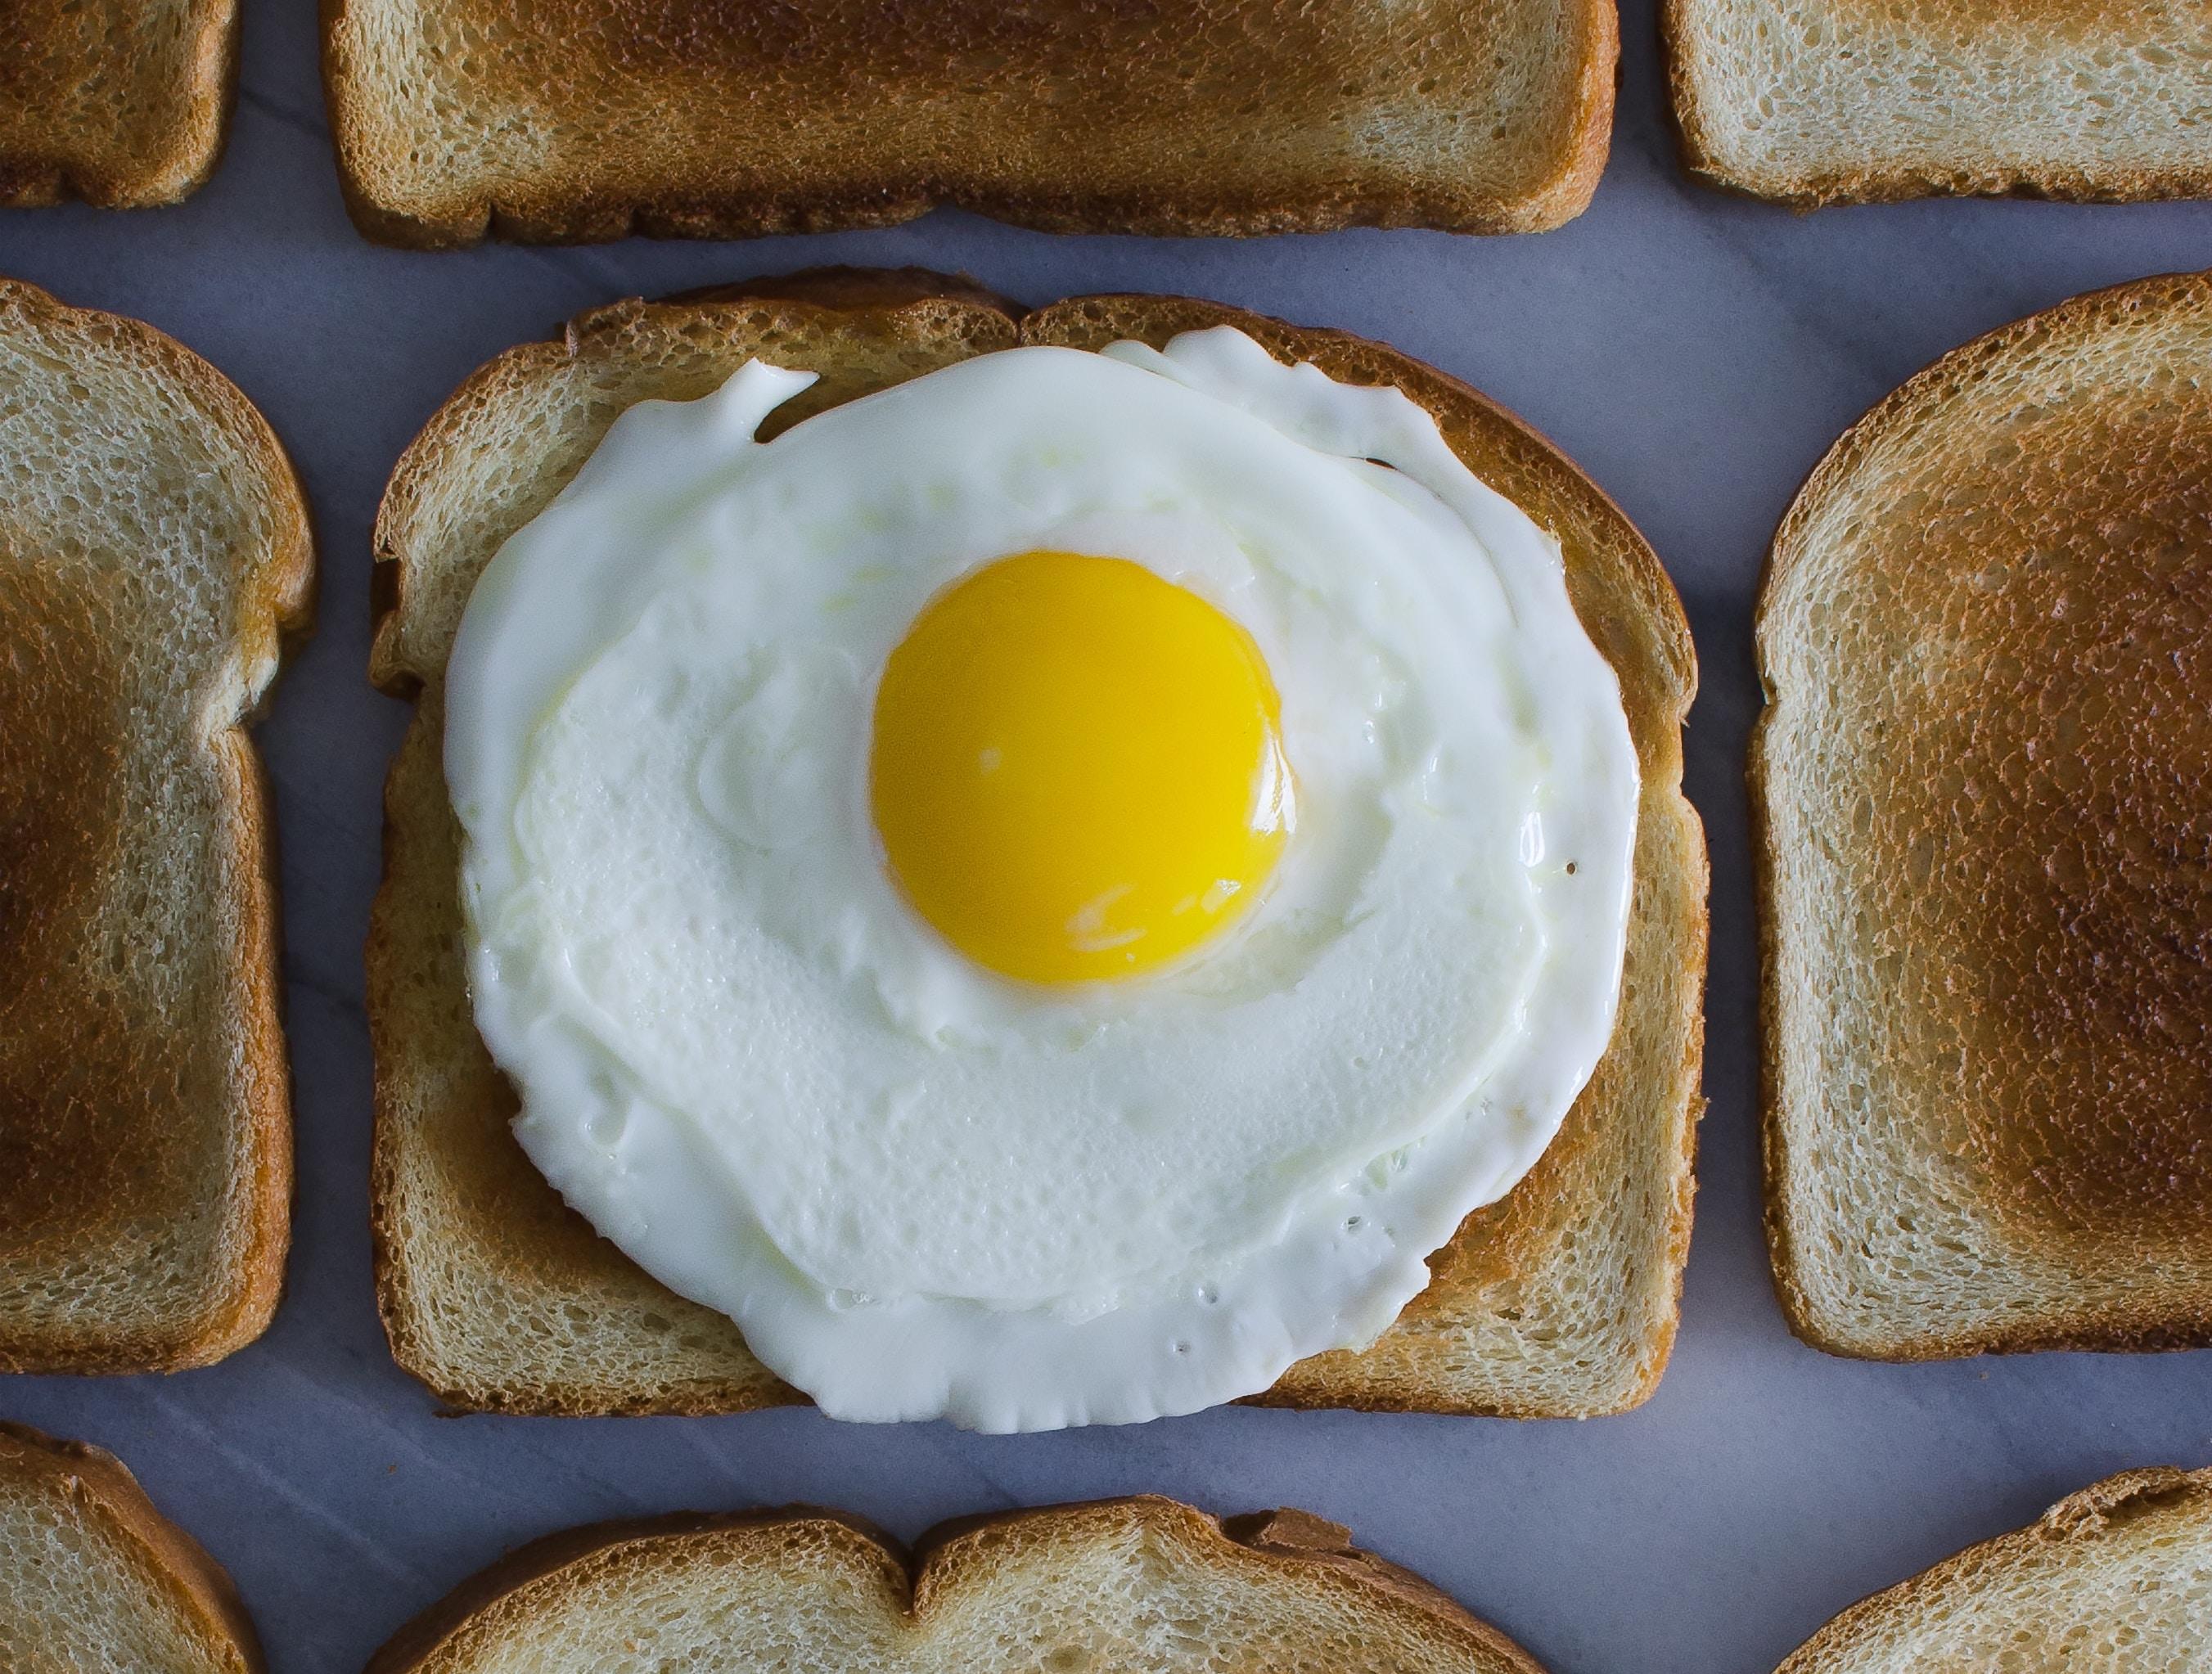 Sunny side egg on toast